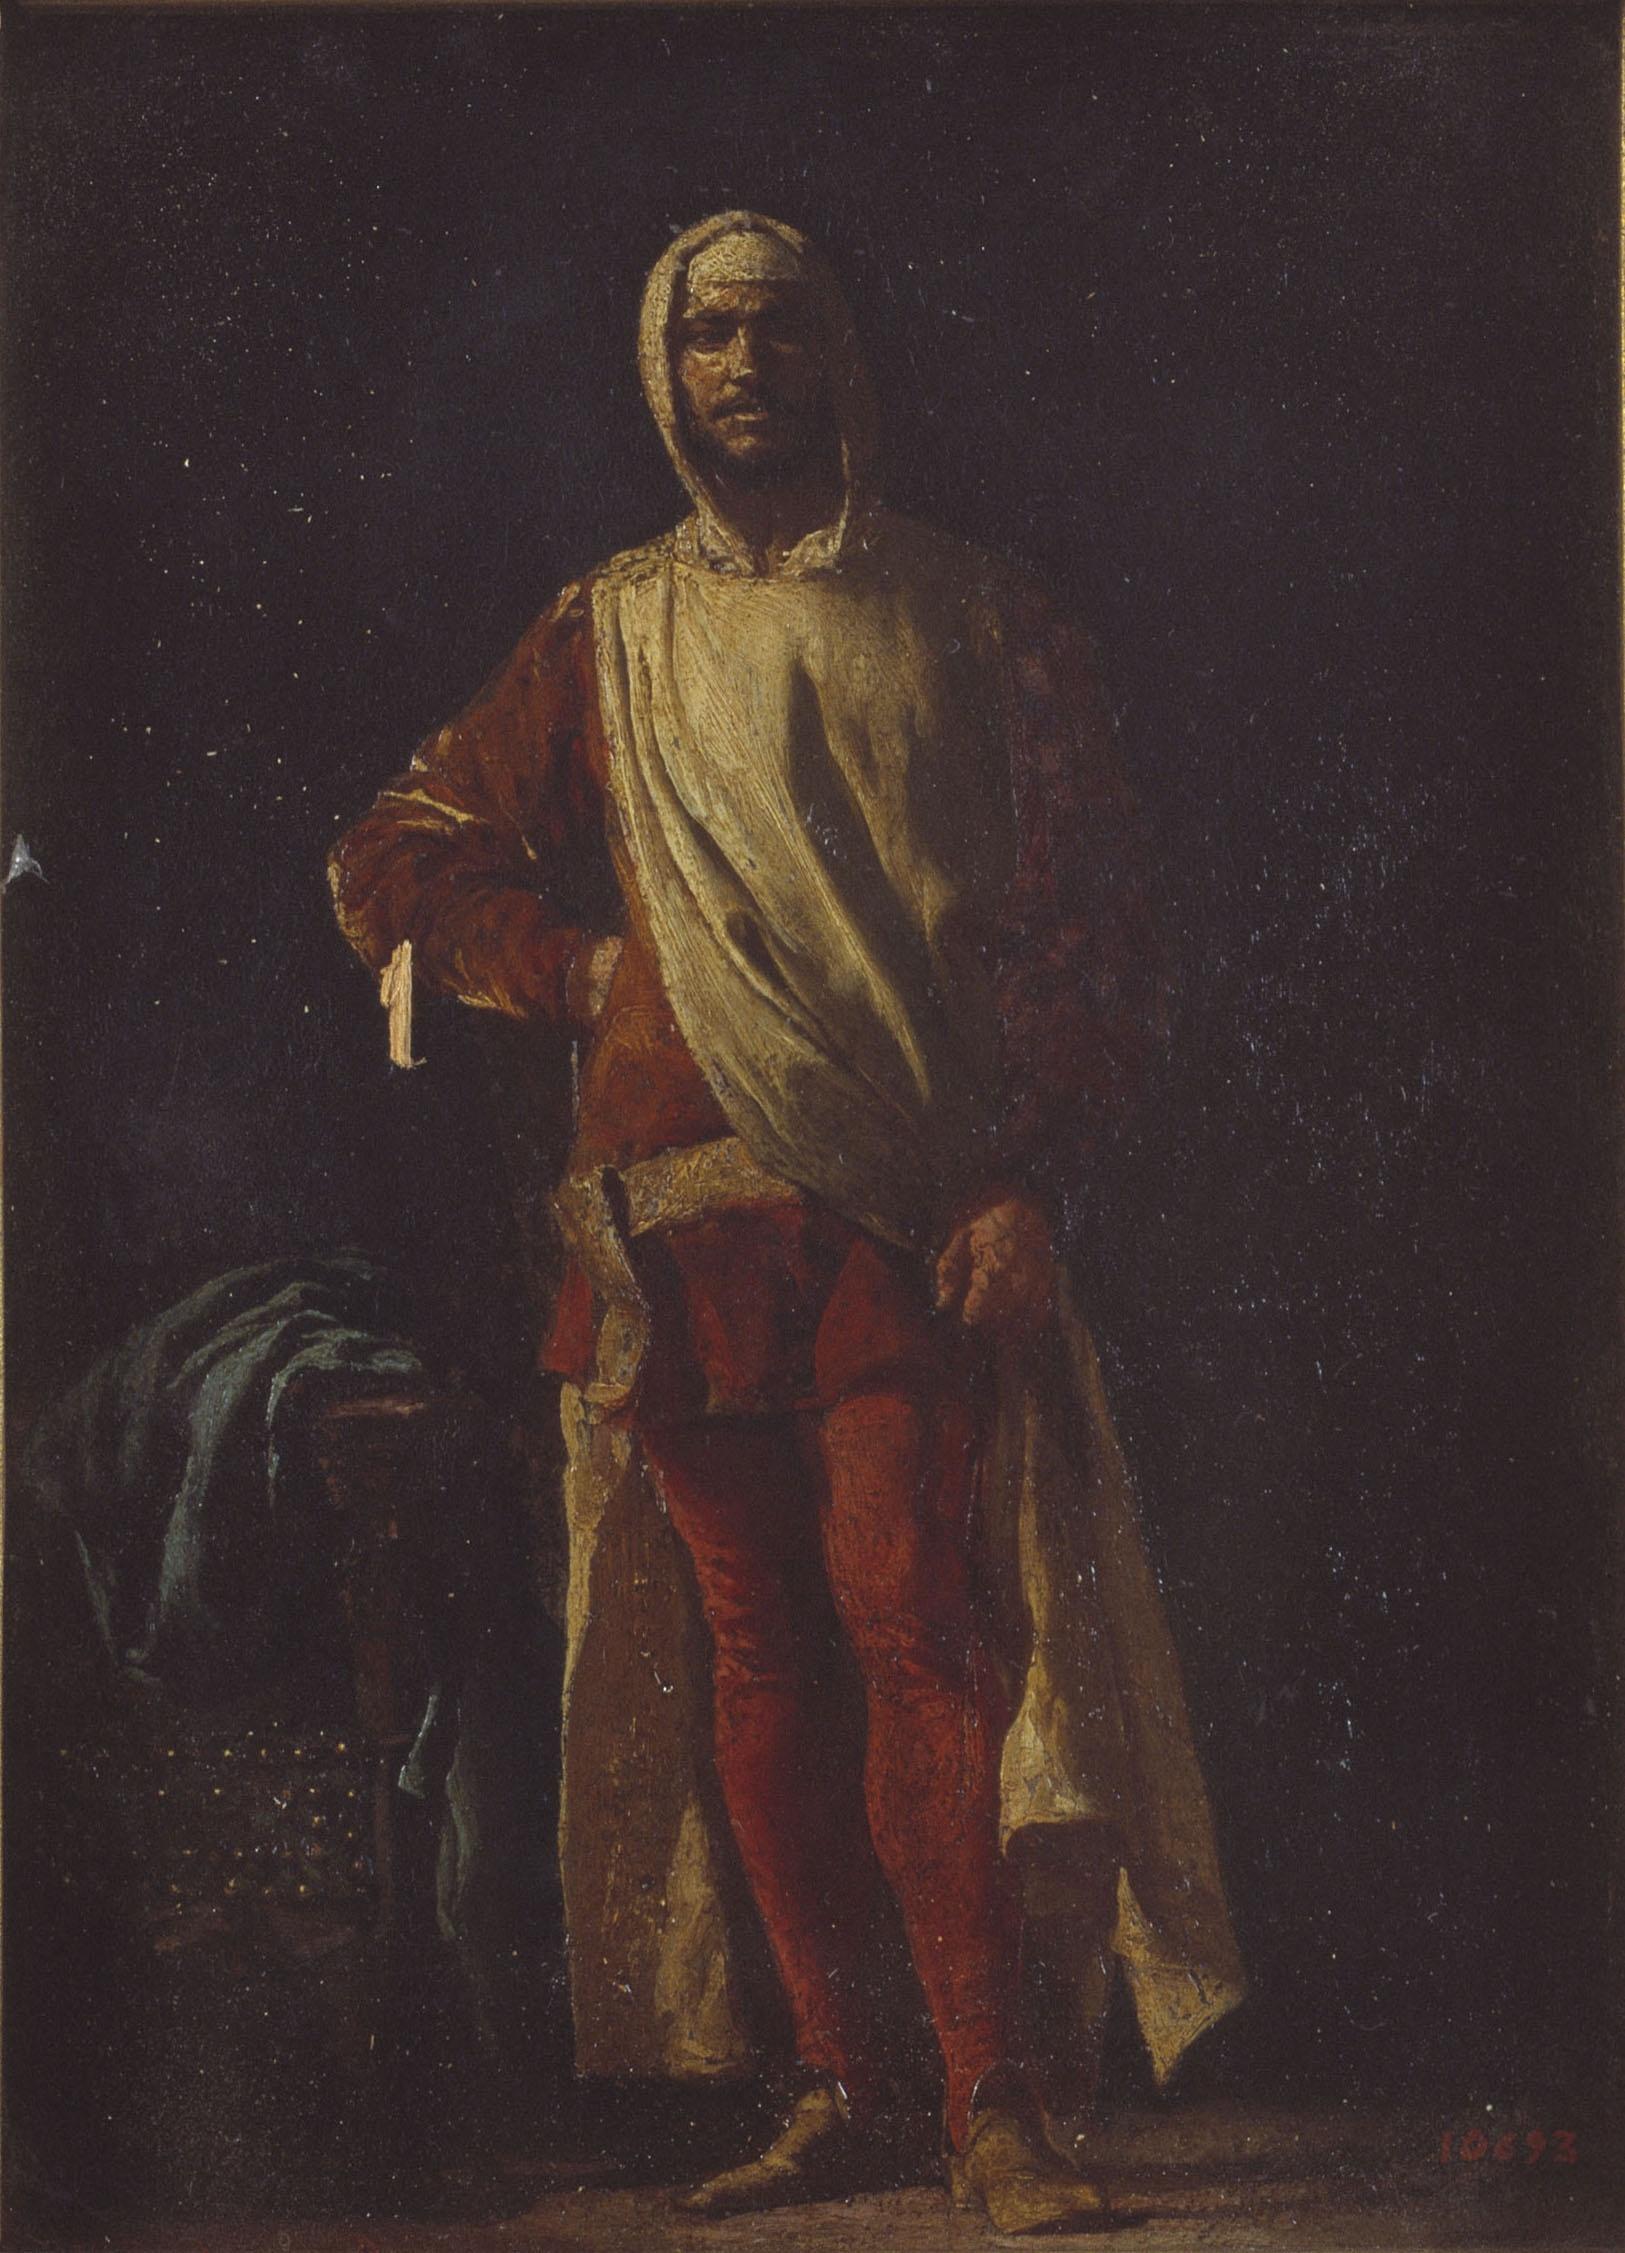 Marià Fortuny - Soldat florentí - Roma, 1862